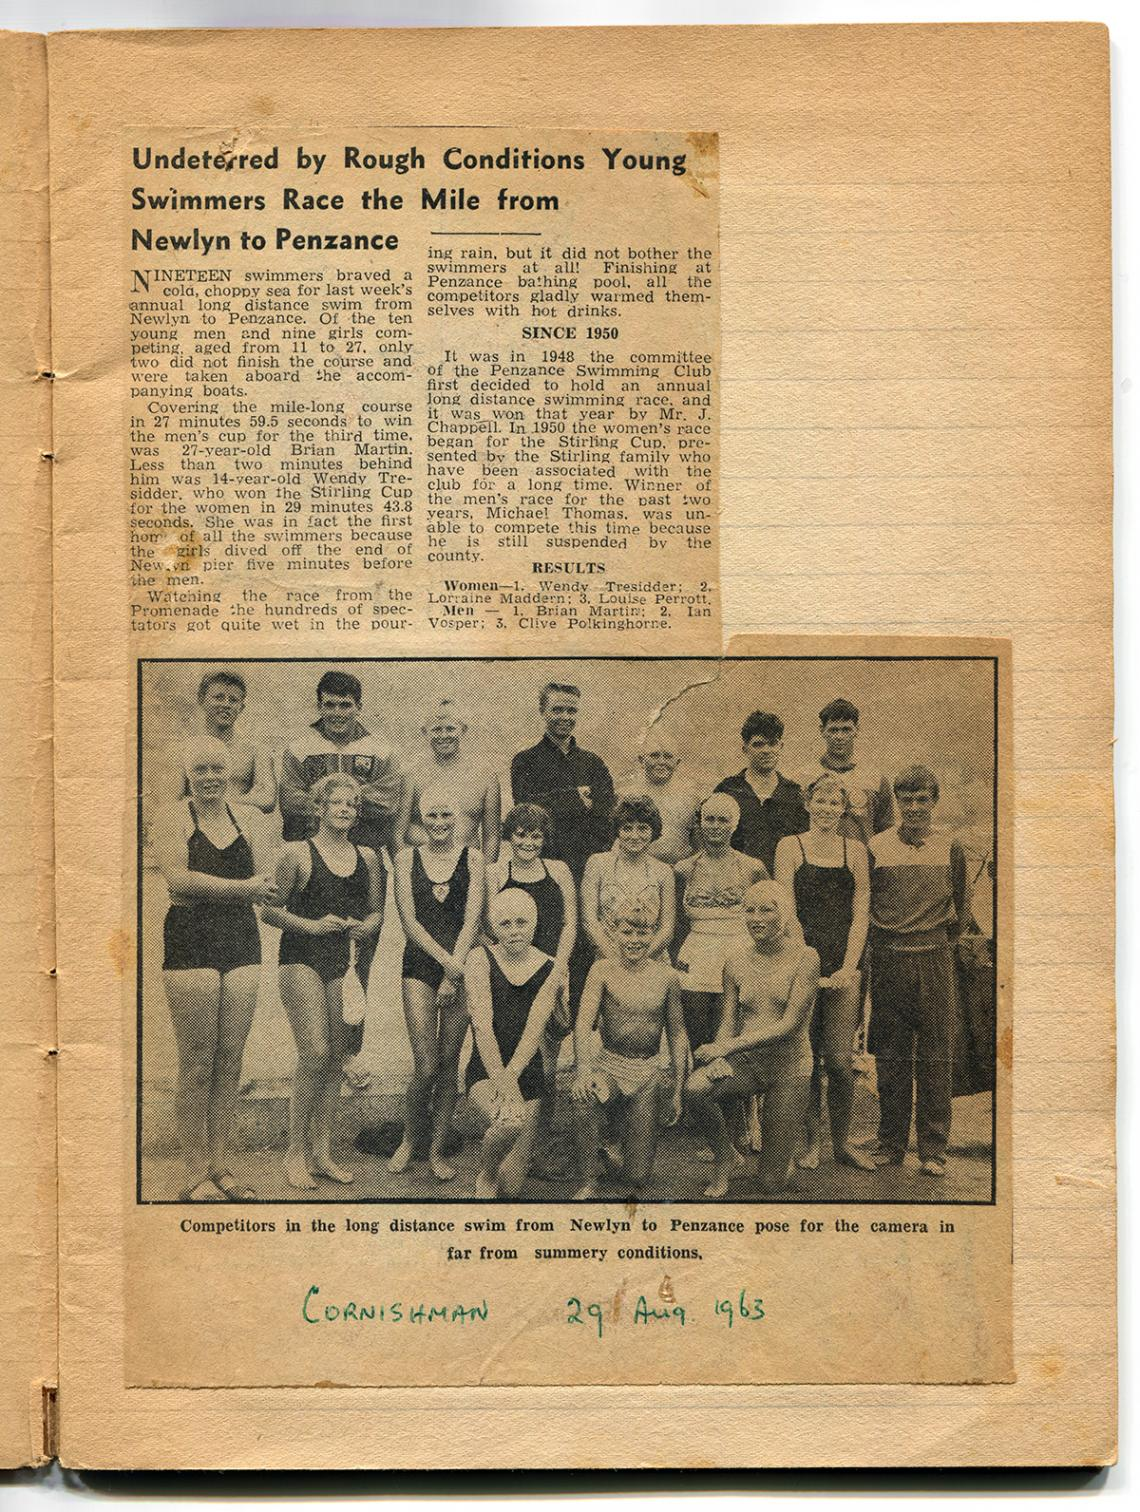 Newspaper cutting, the long distance swim